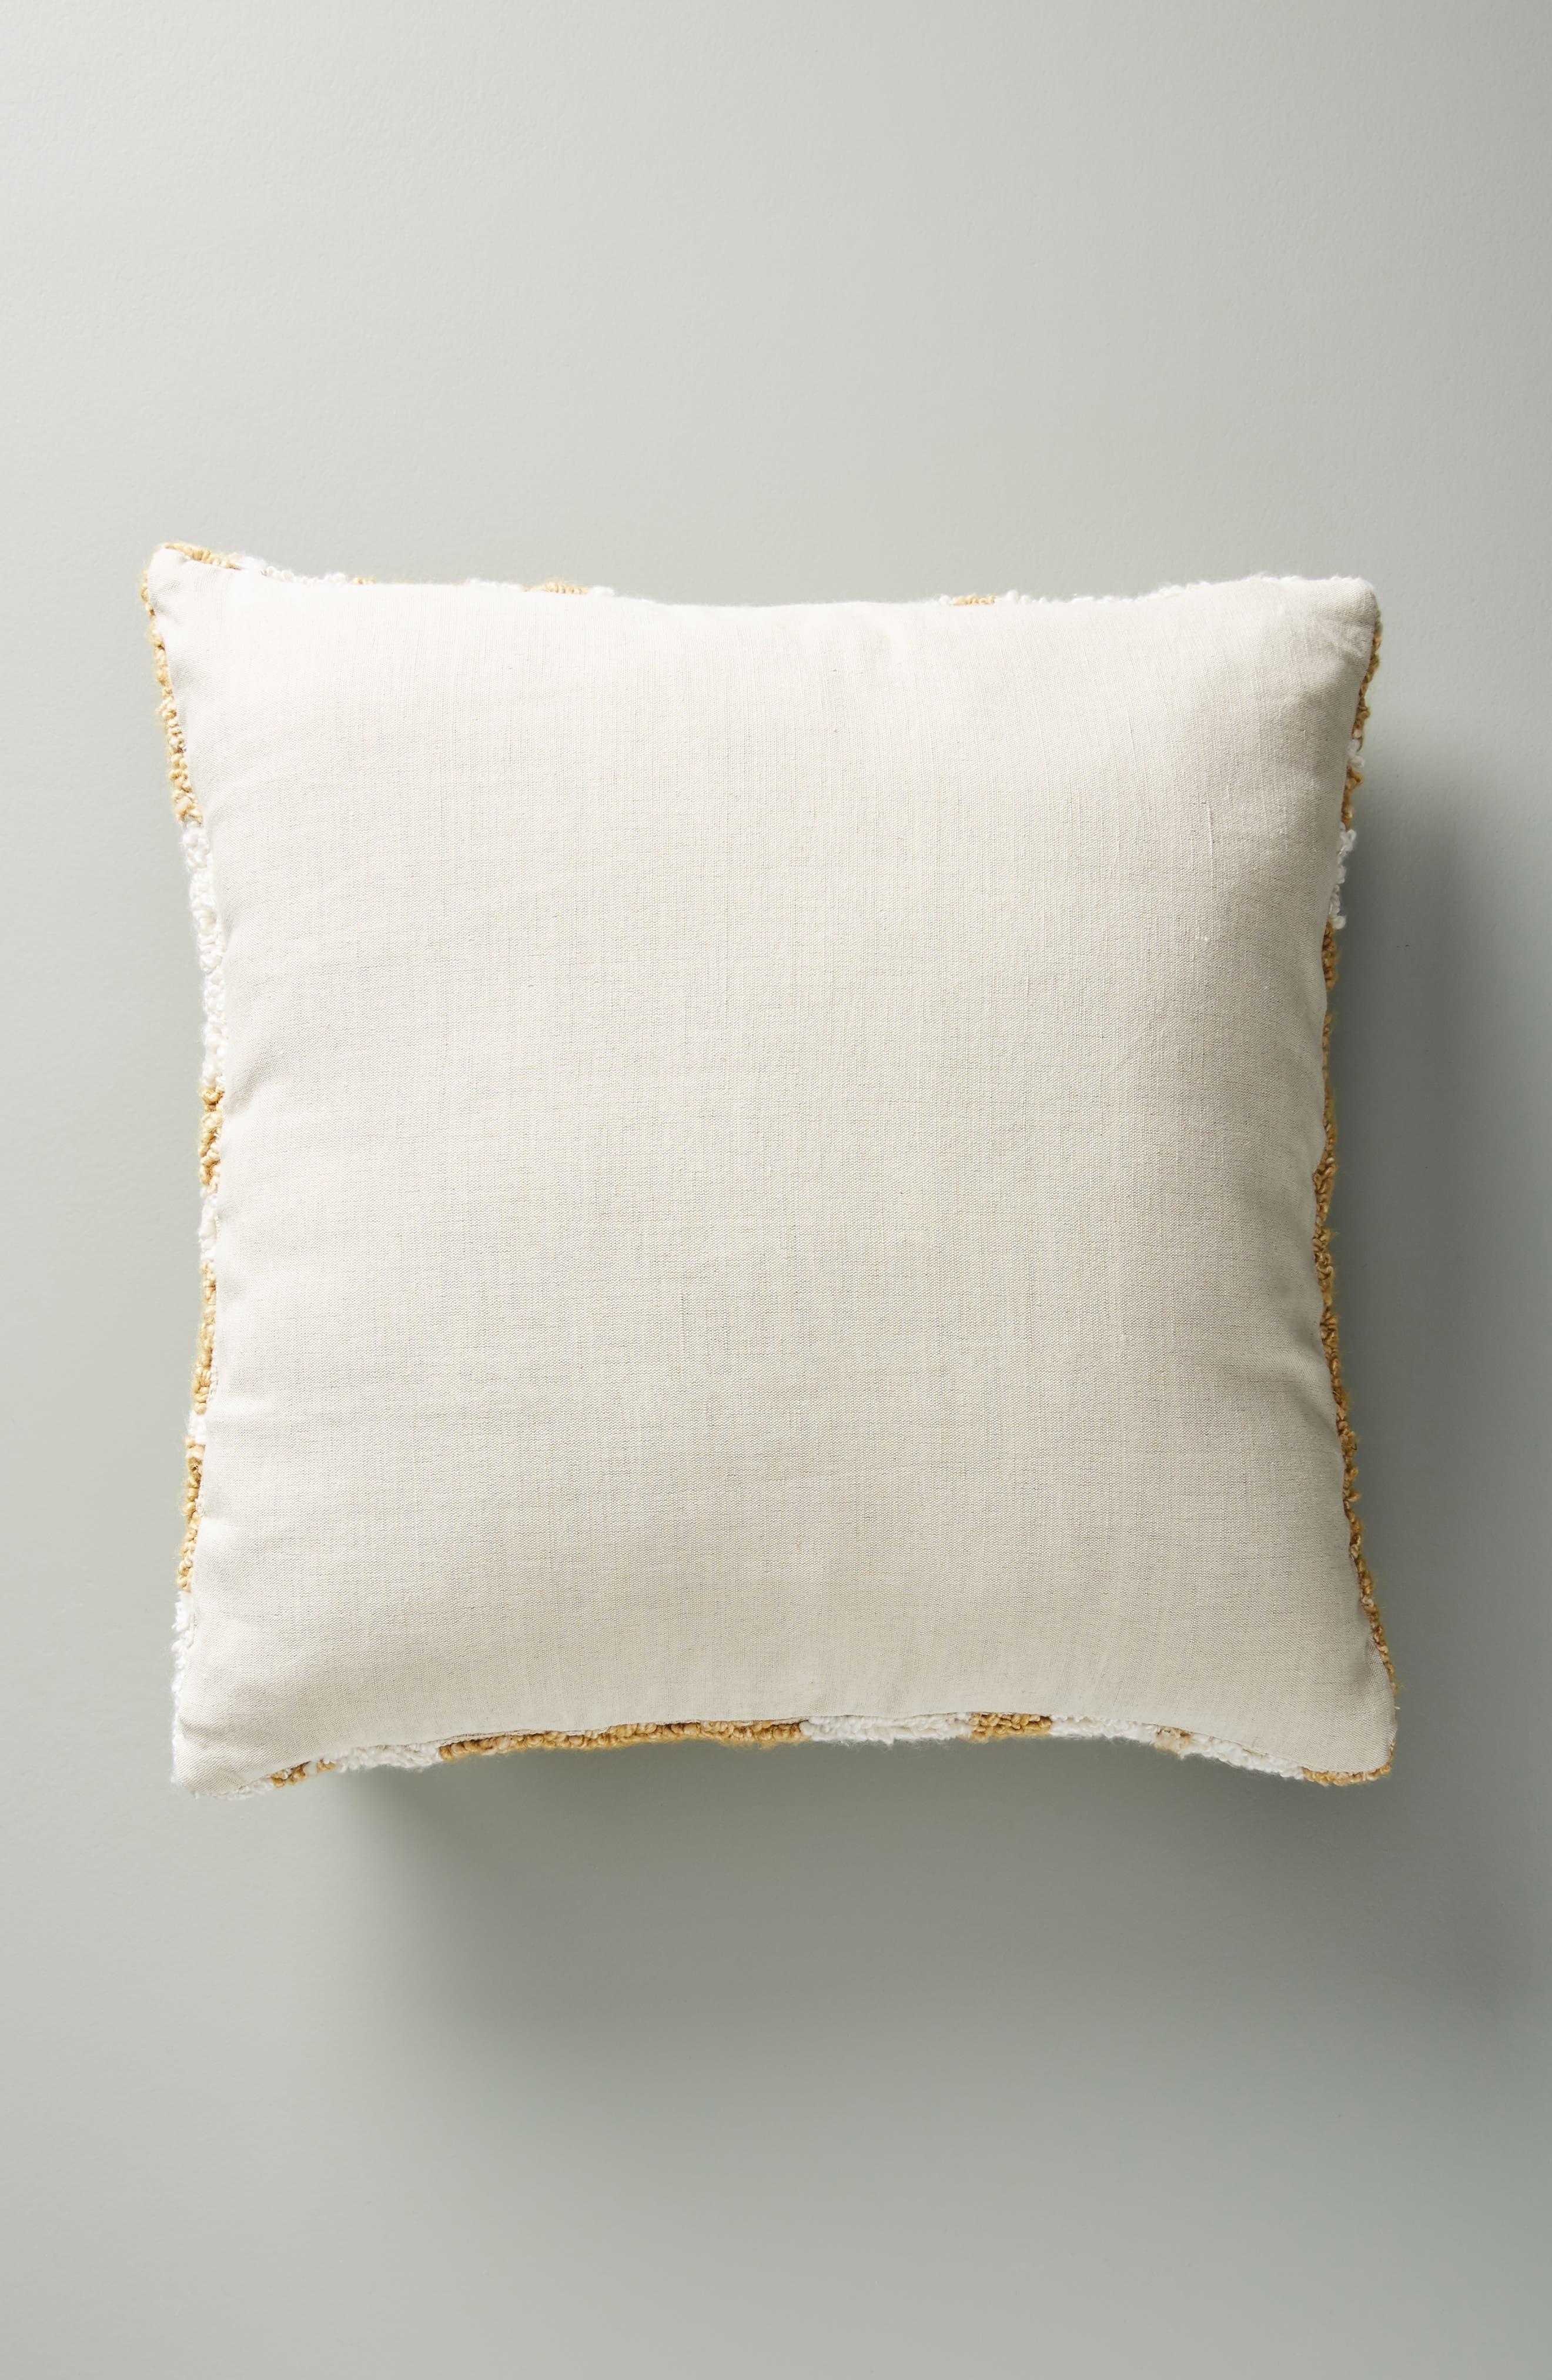 ANTHROPOLOGIE, Jordana Accent Pillow, Alternate thumbnail 2, color, 700